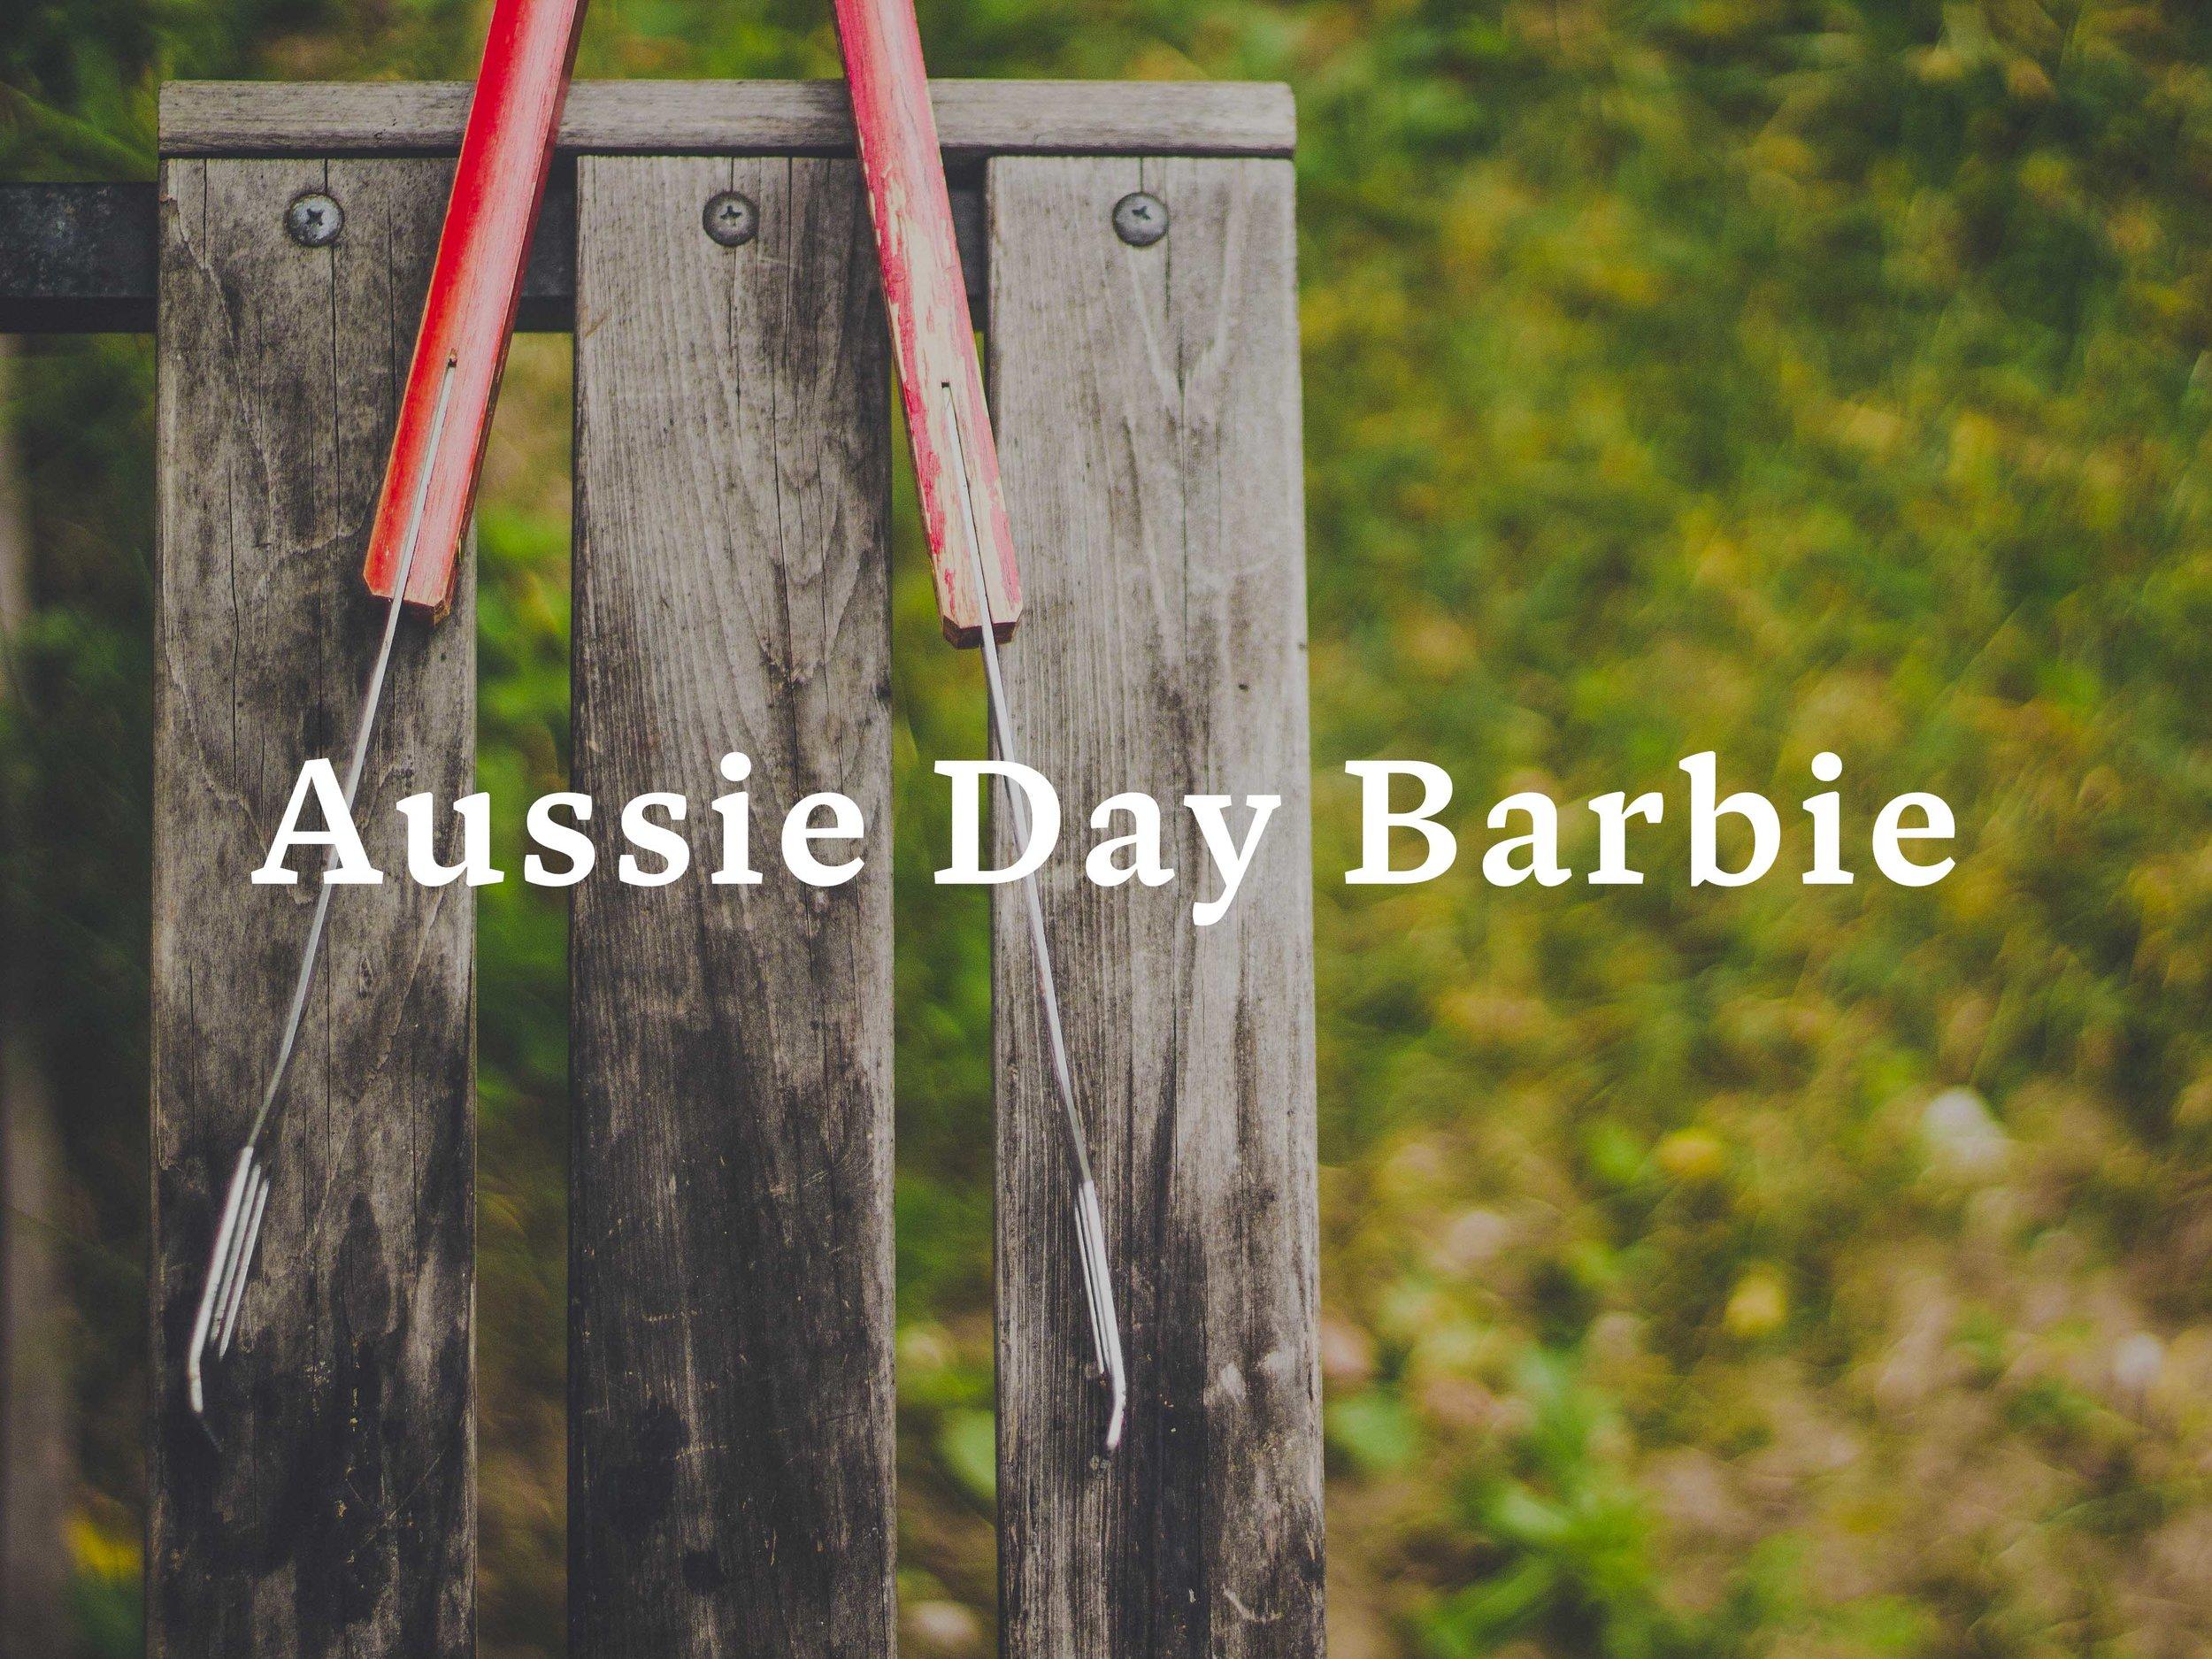 AussieDayBarbie.jpg